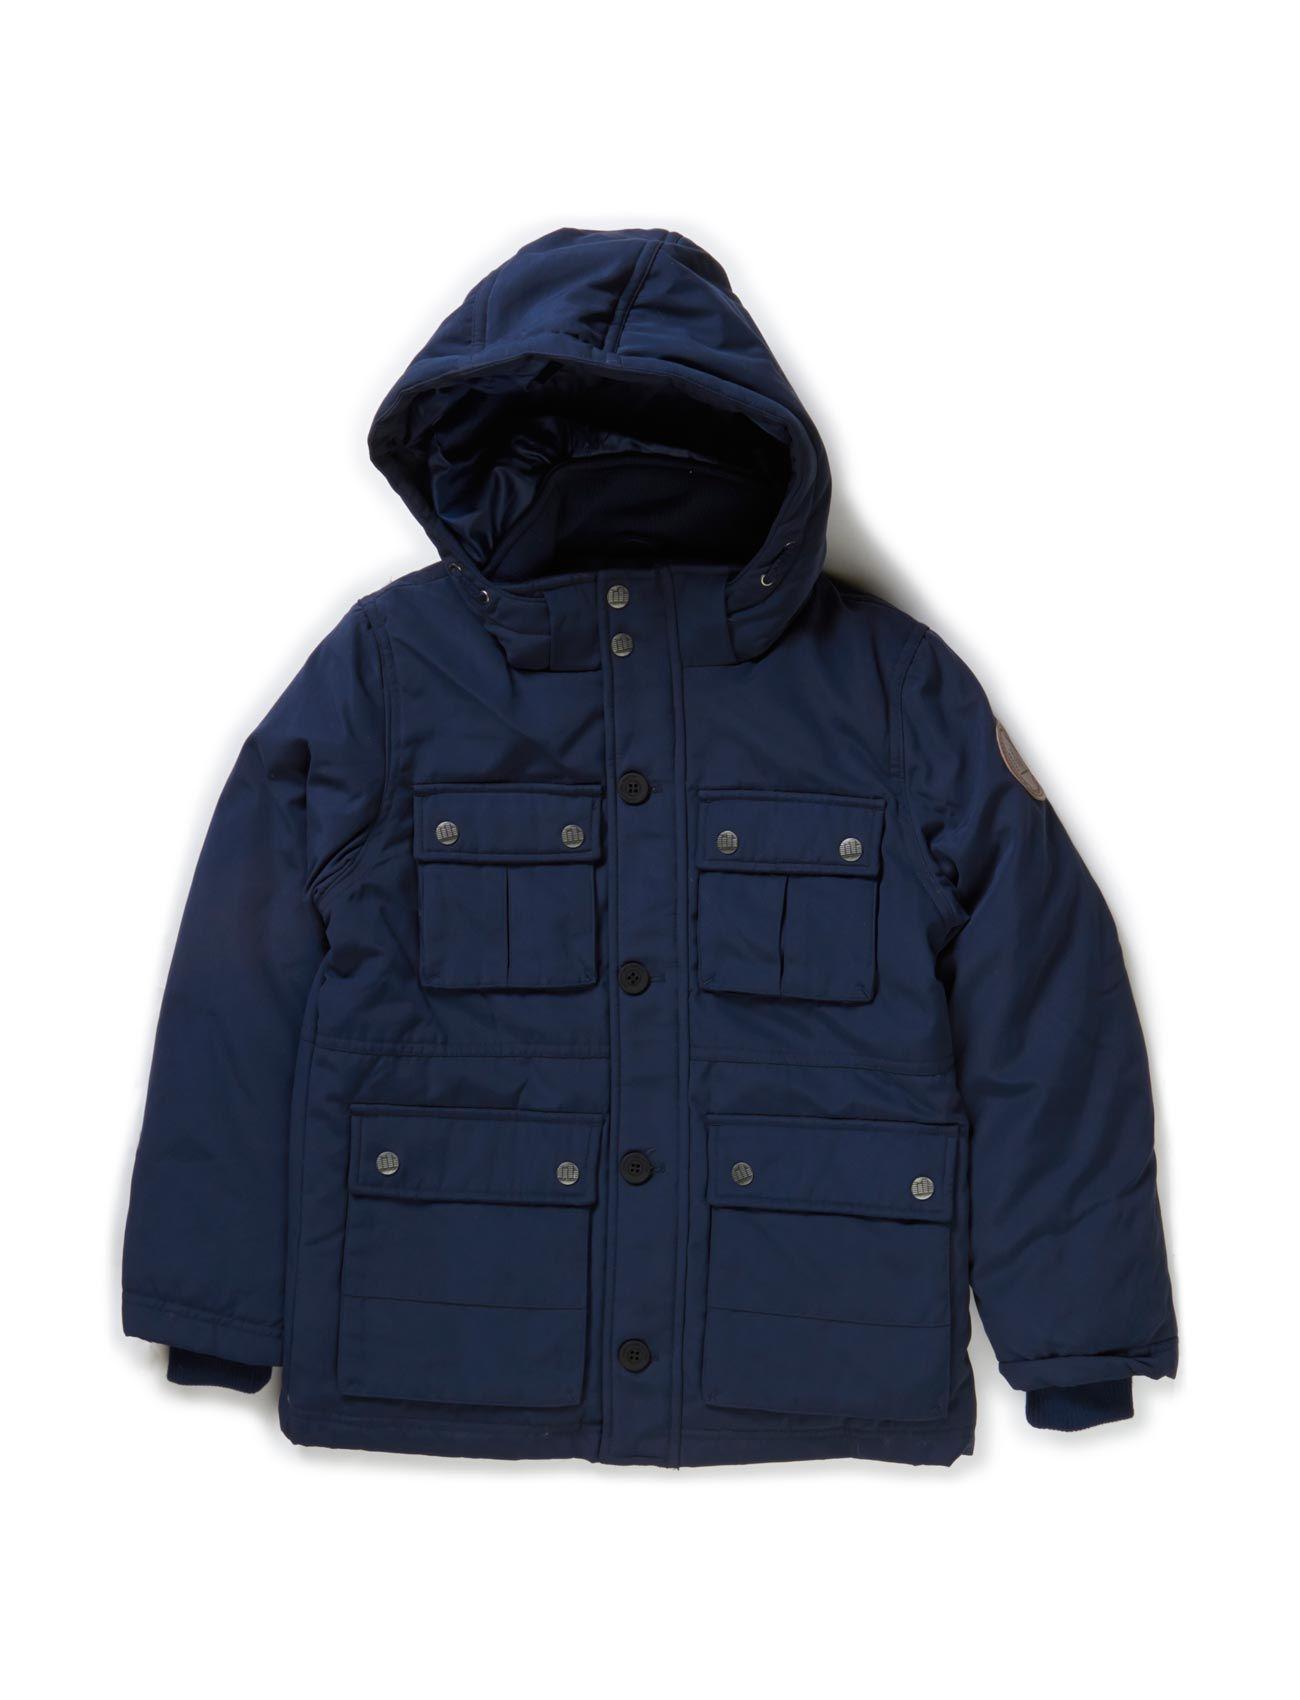 Allin M Down Jacket 314